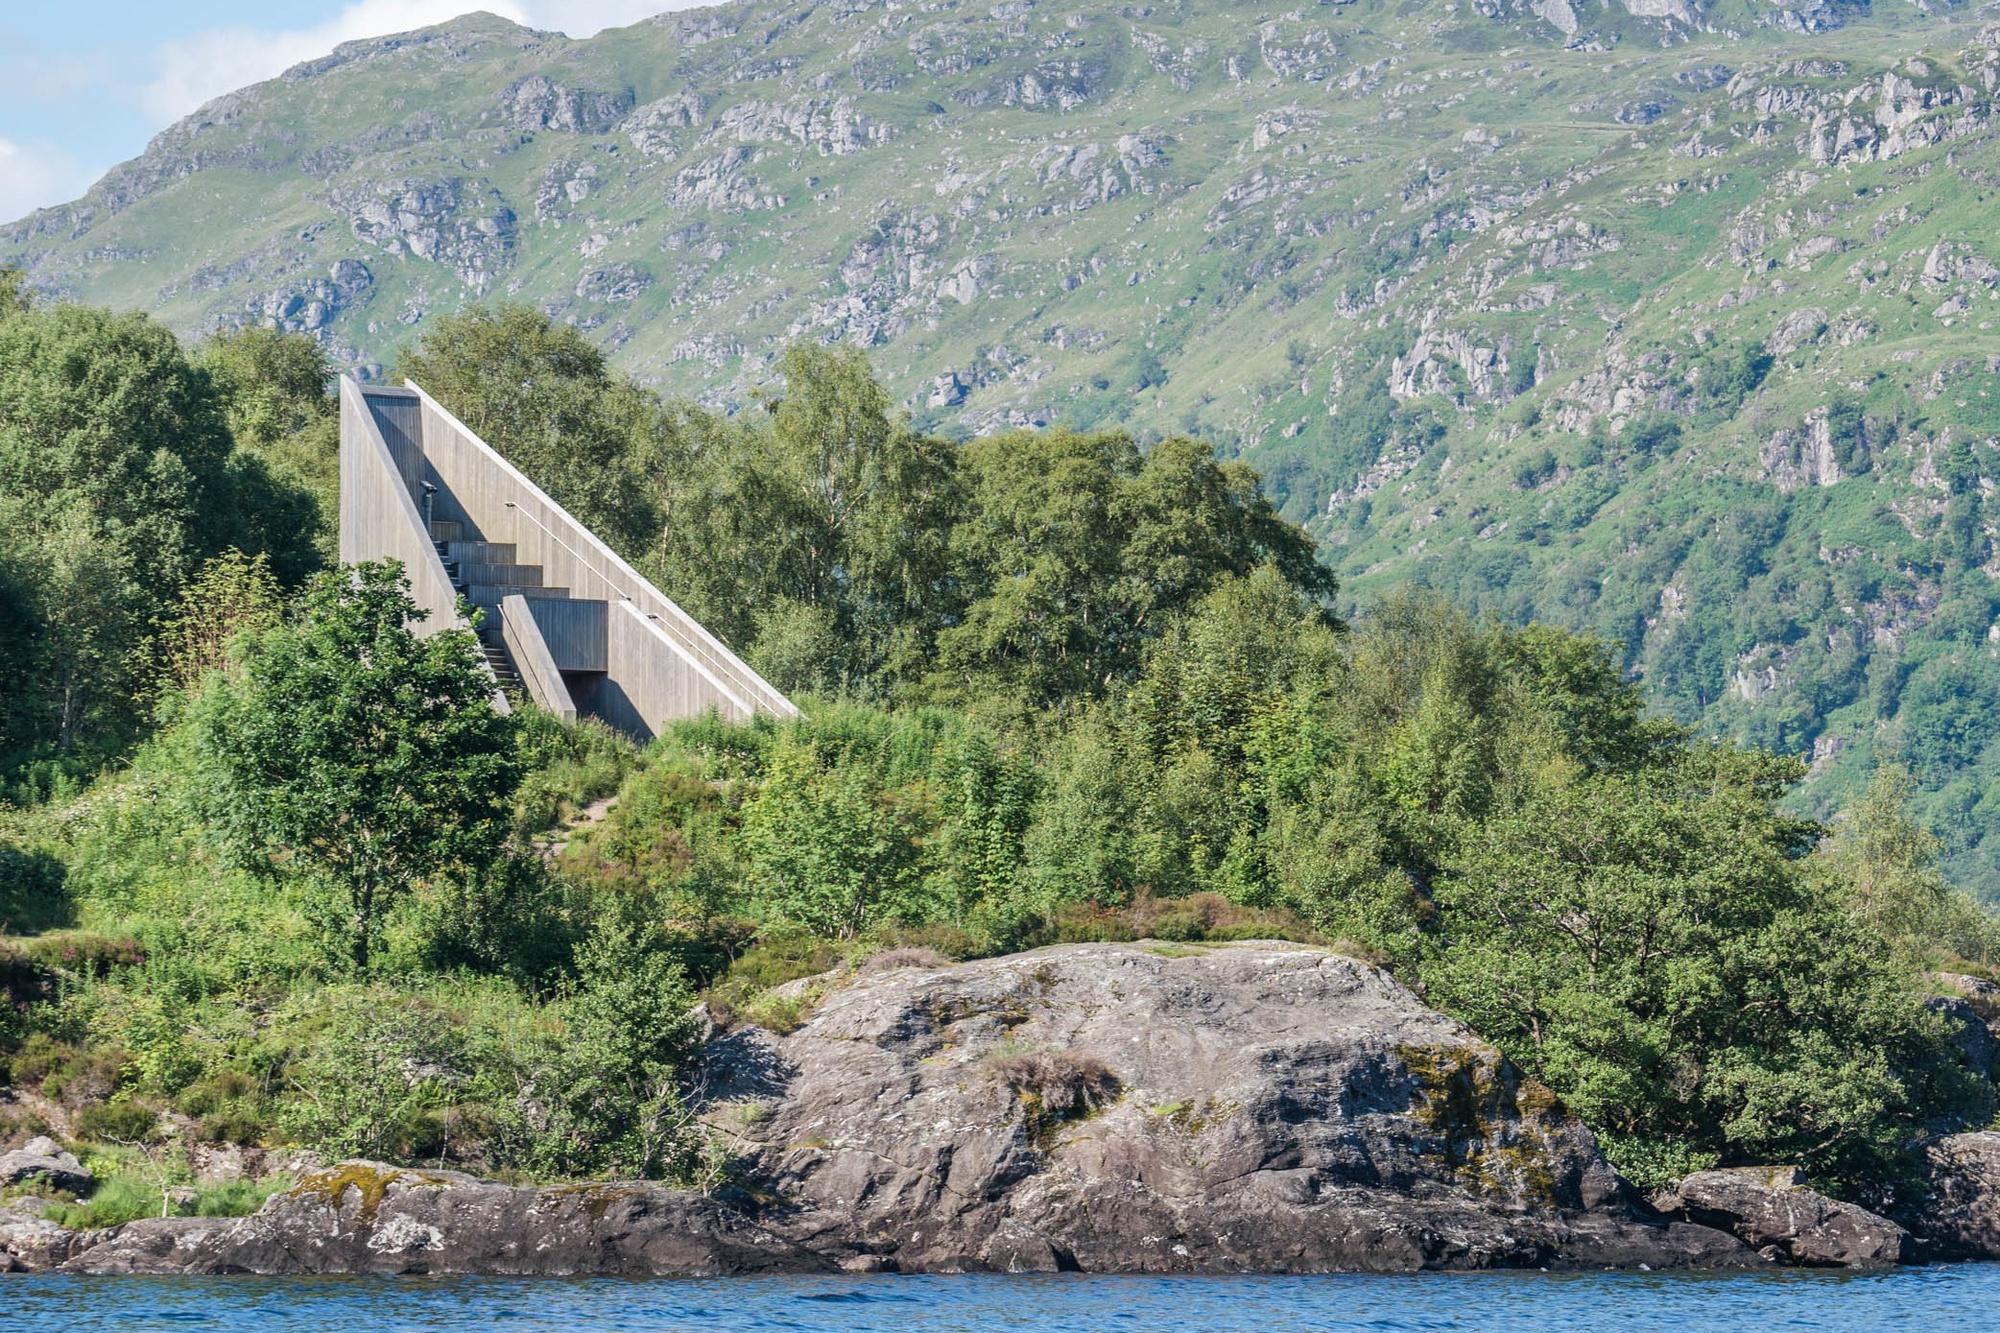 ., See Loch Lomond